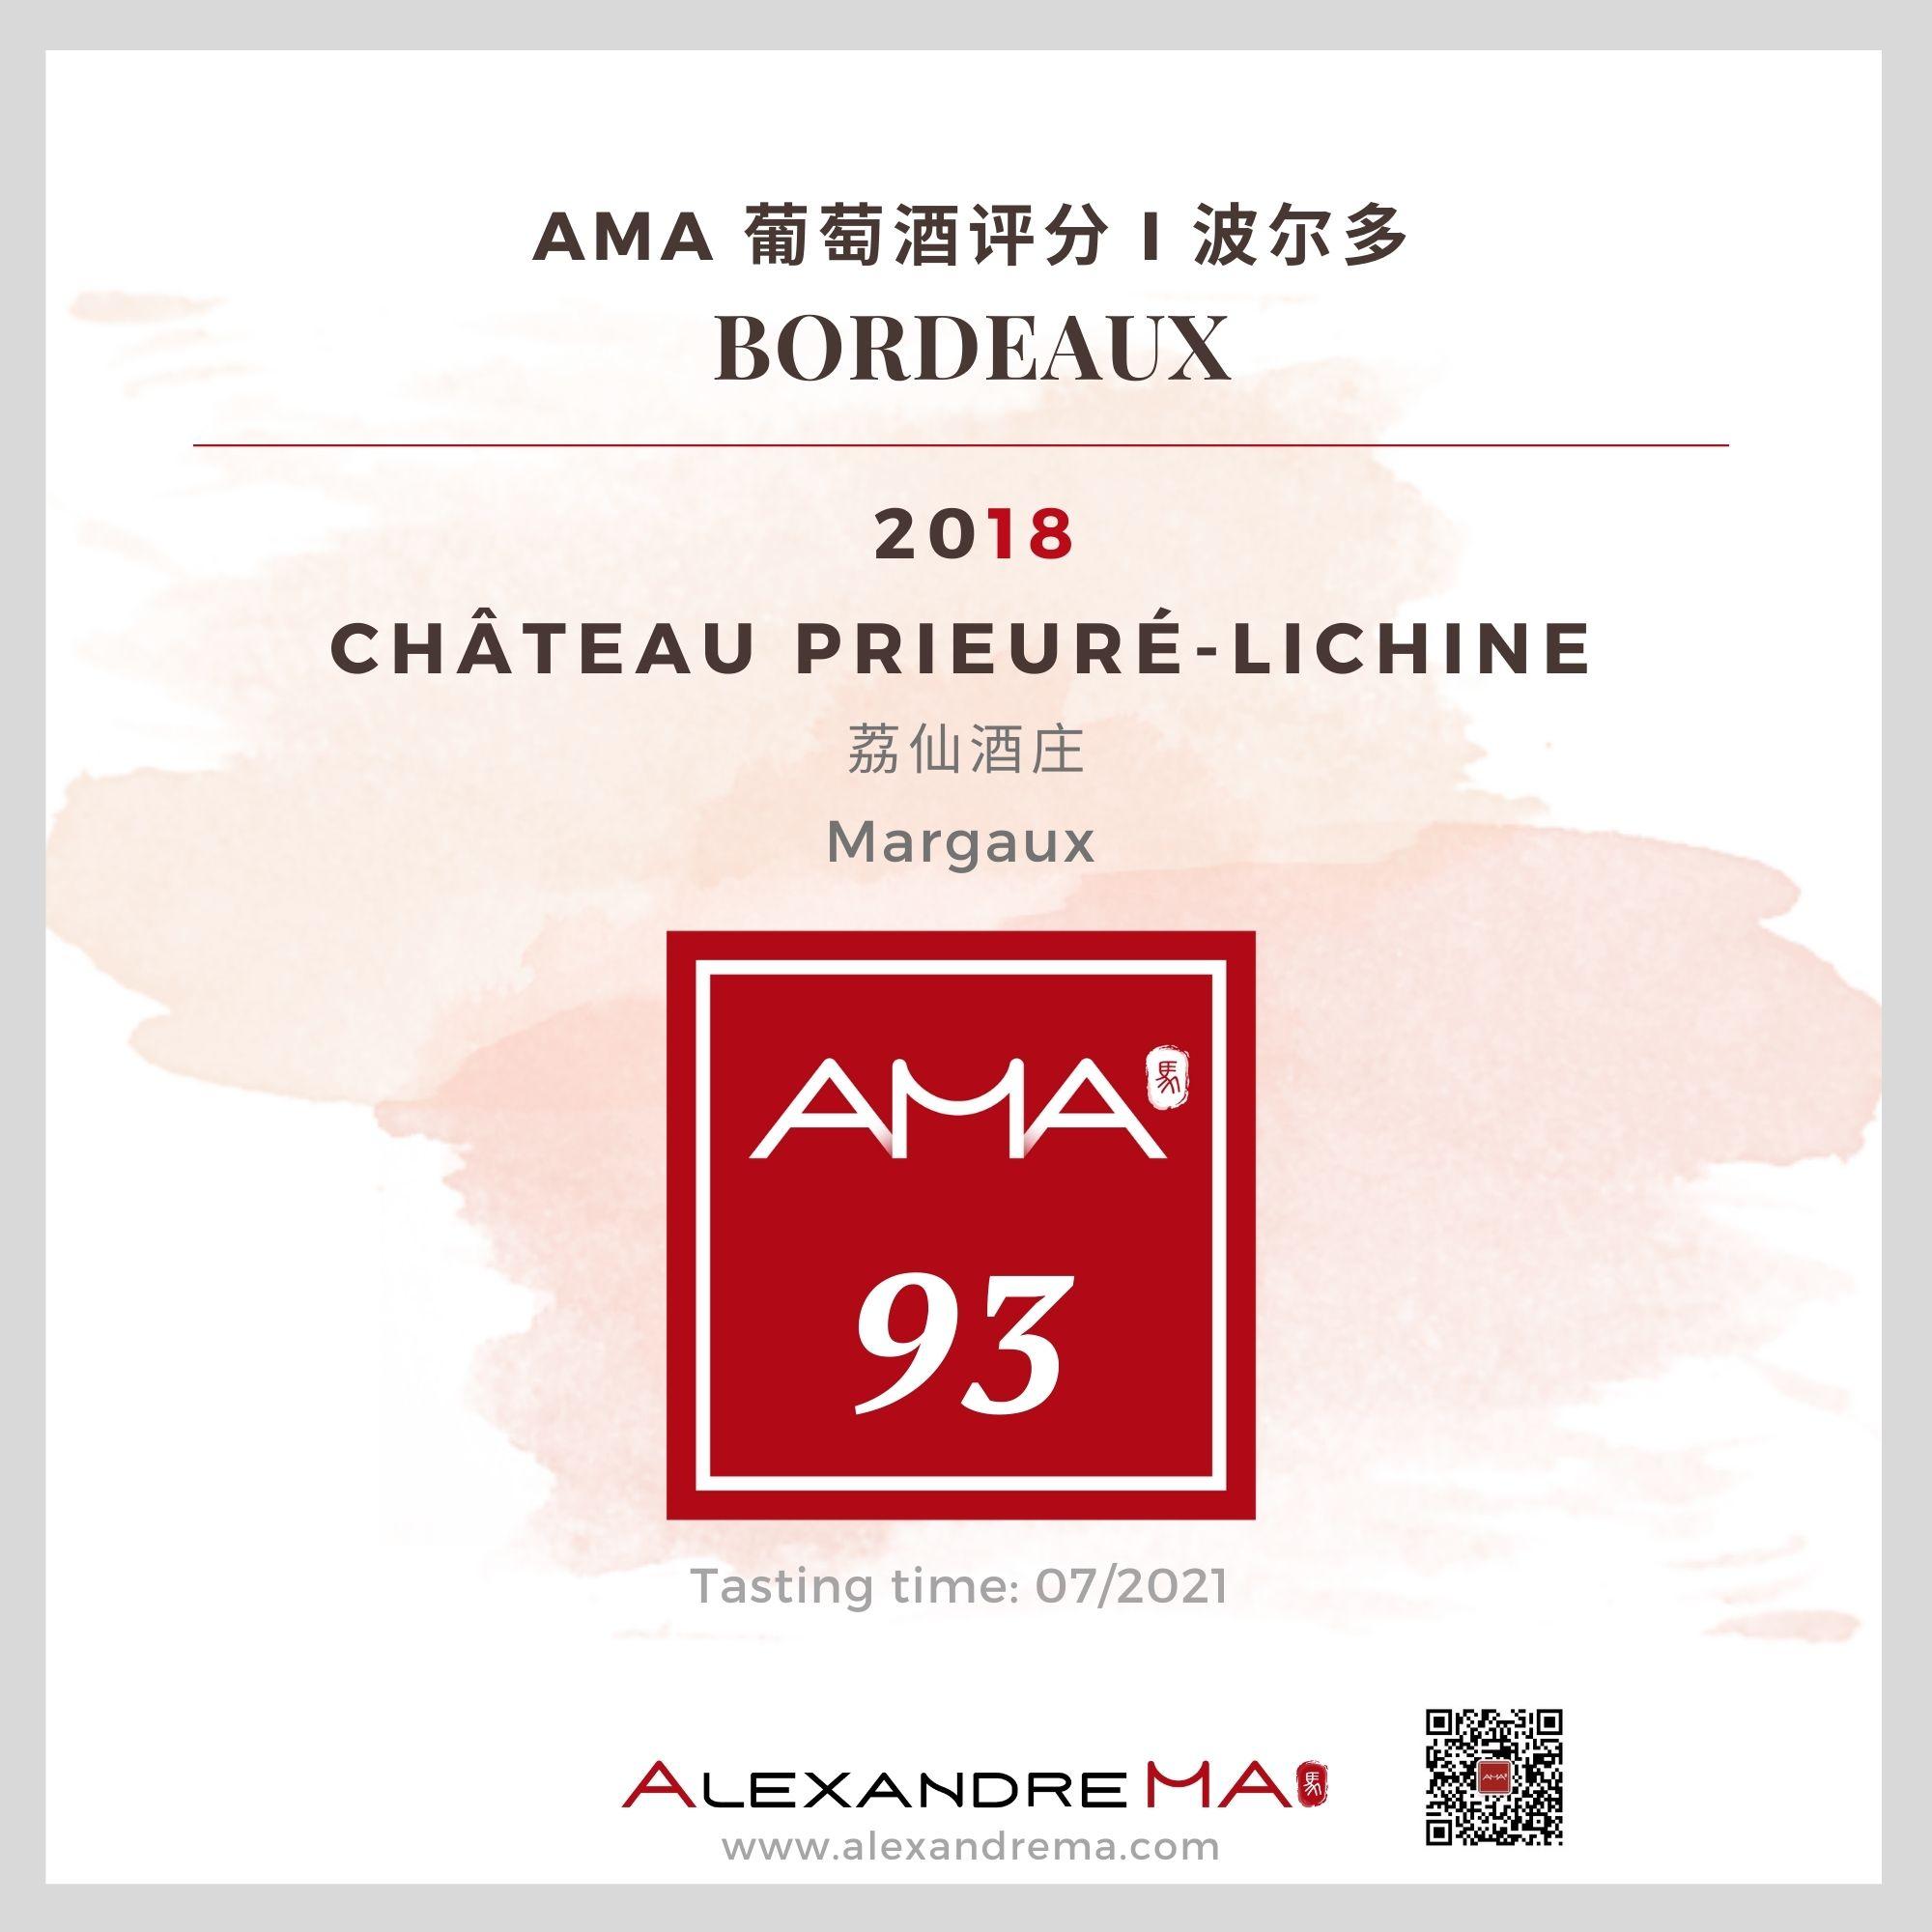 Château Prieuré-Lichine 2018 - Alexandre MA